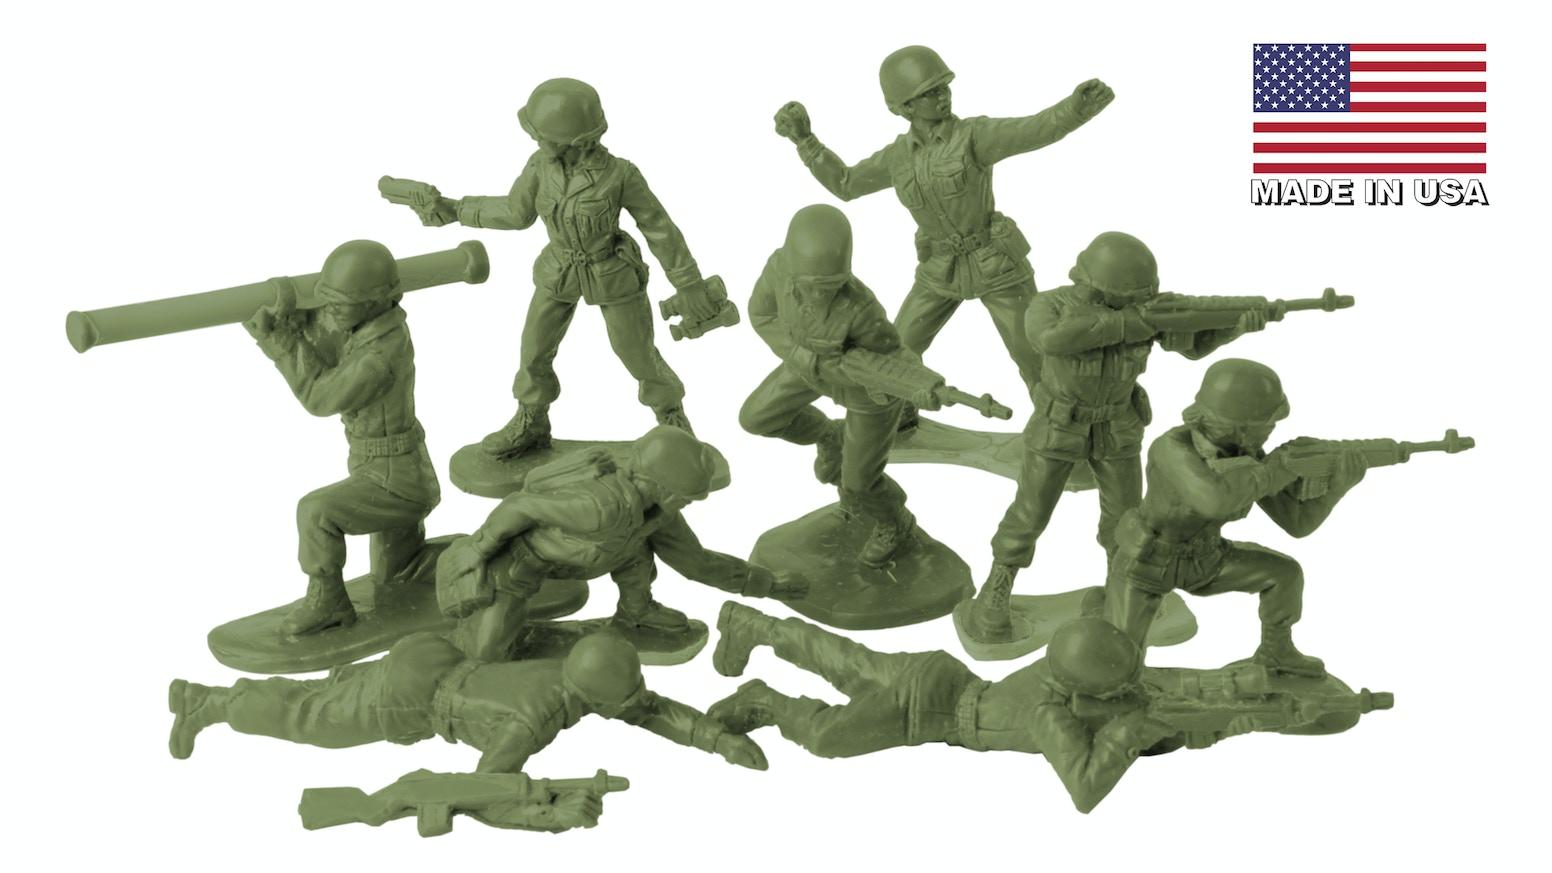 BMC Toys Plastic Army Women Toy Soldier Figure Set